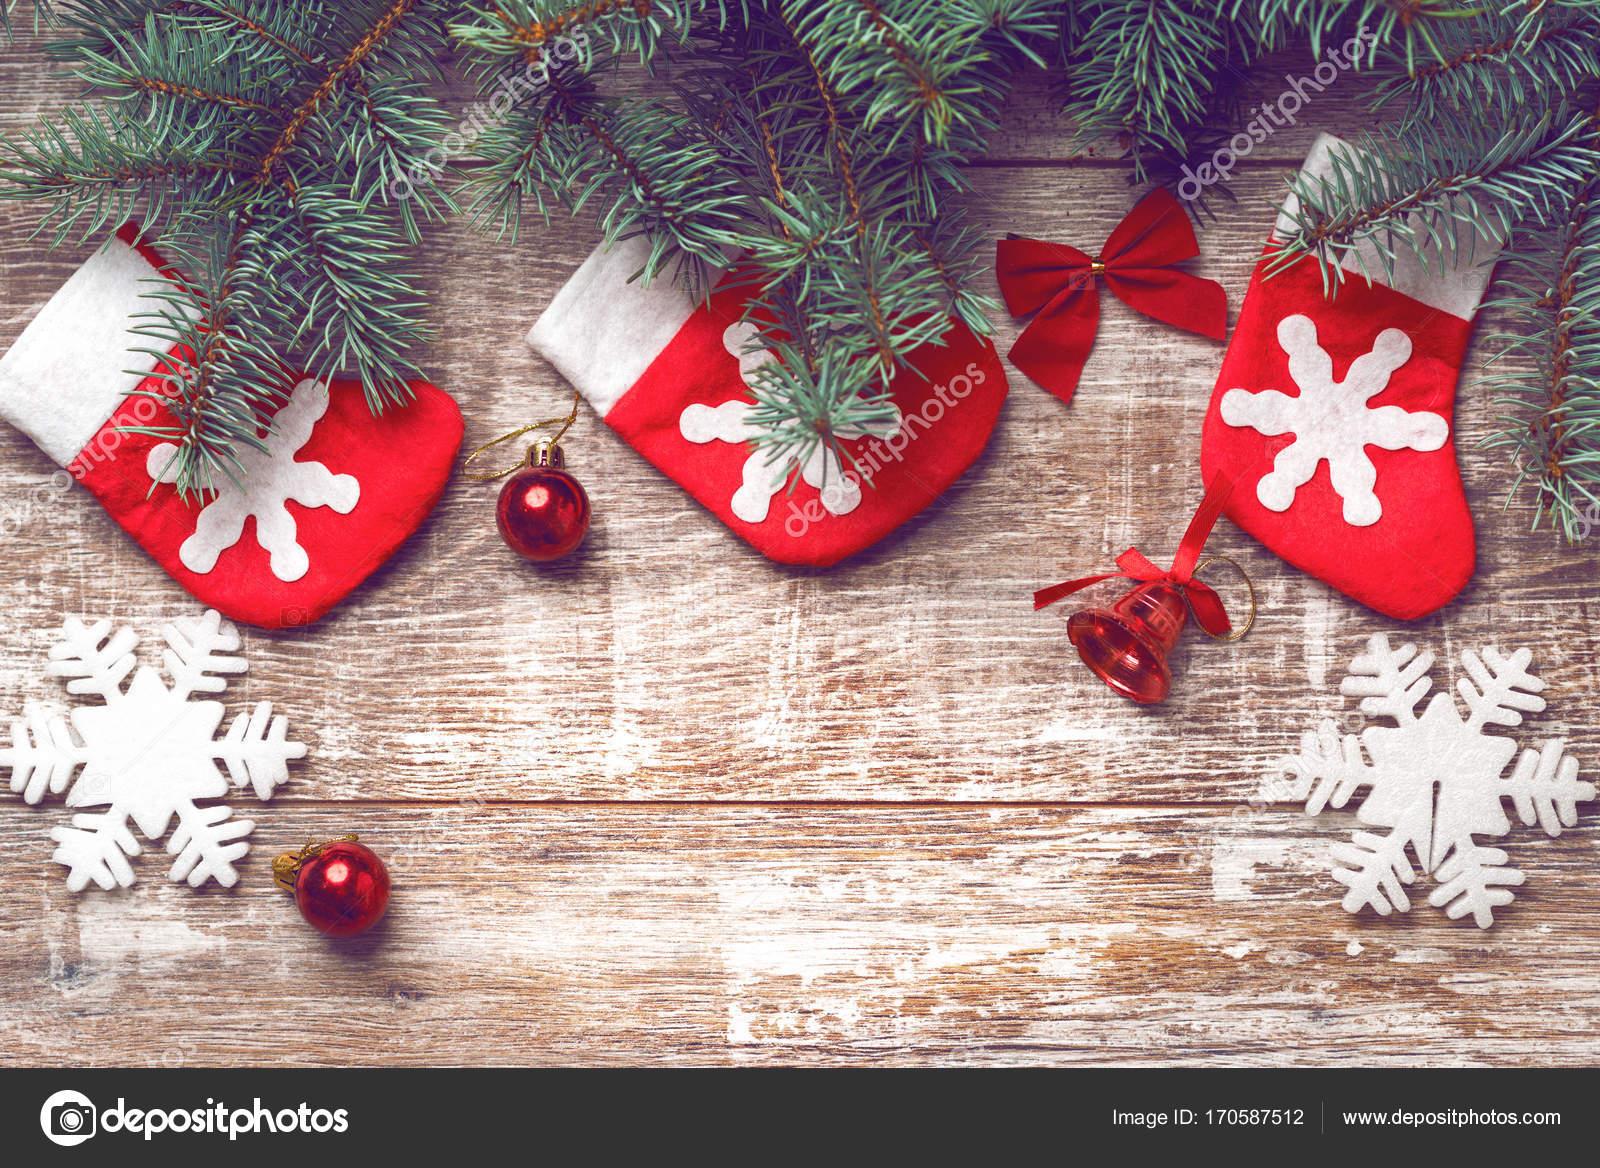 natal 2018 Plano de fundo Natal 2018 — Stock Photo © DmytroKozak #170587512 natal 2018